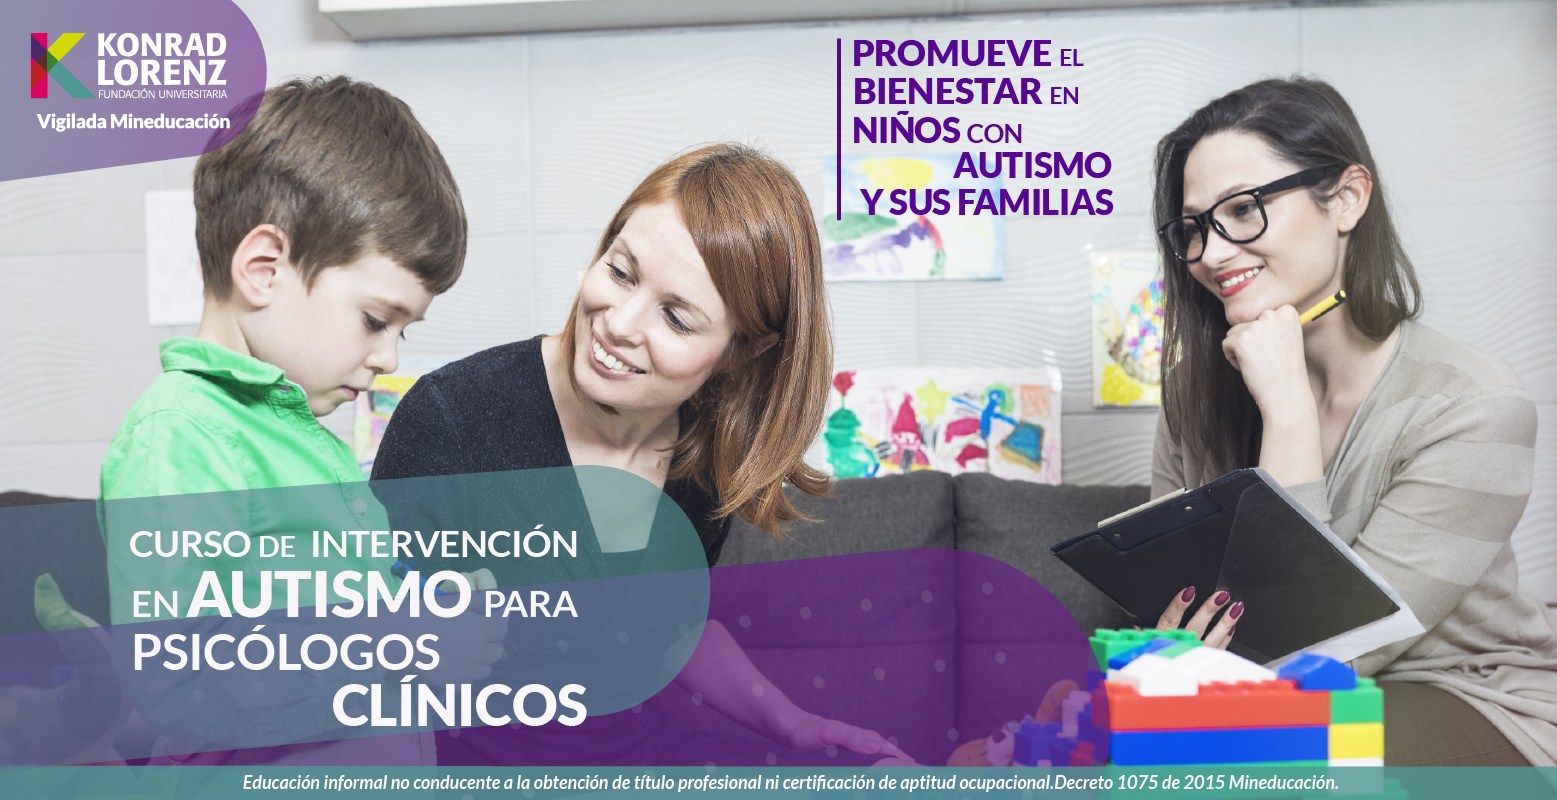 Curso avanzado de intervención en Autismo para Psicólogos Clínicos